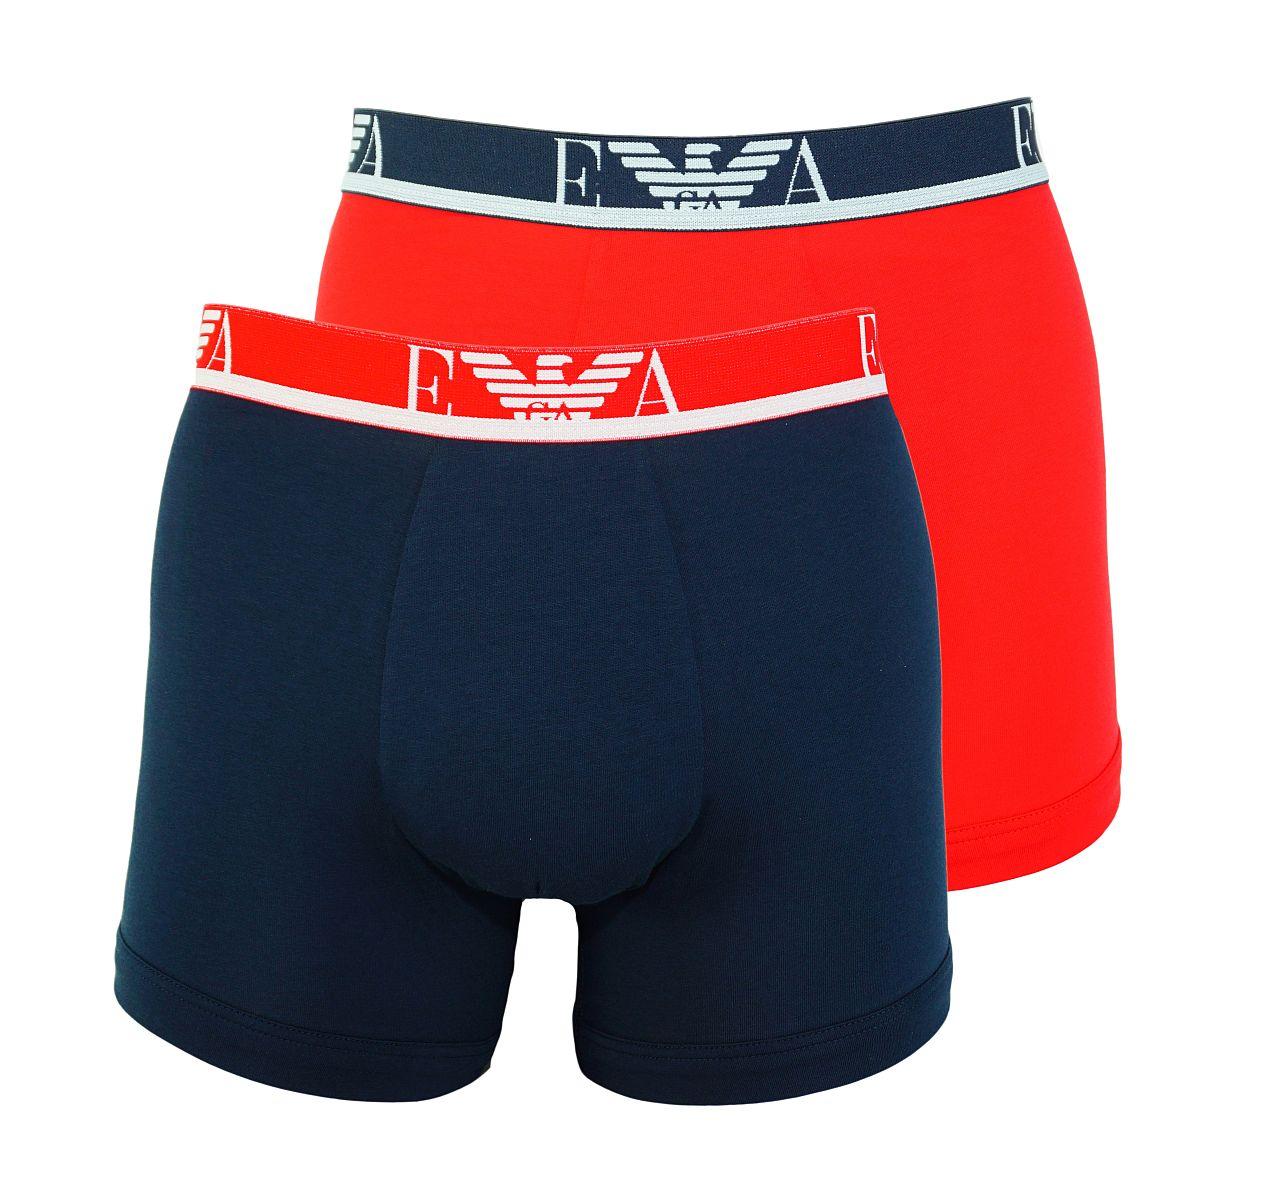 Emporio Armani 2er Pack Shorts Boxer Unterhose 111268 8P715 26674 TANGO RED/MARINE W18-EAB1